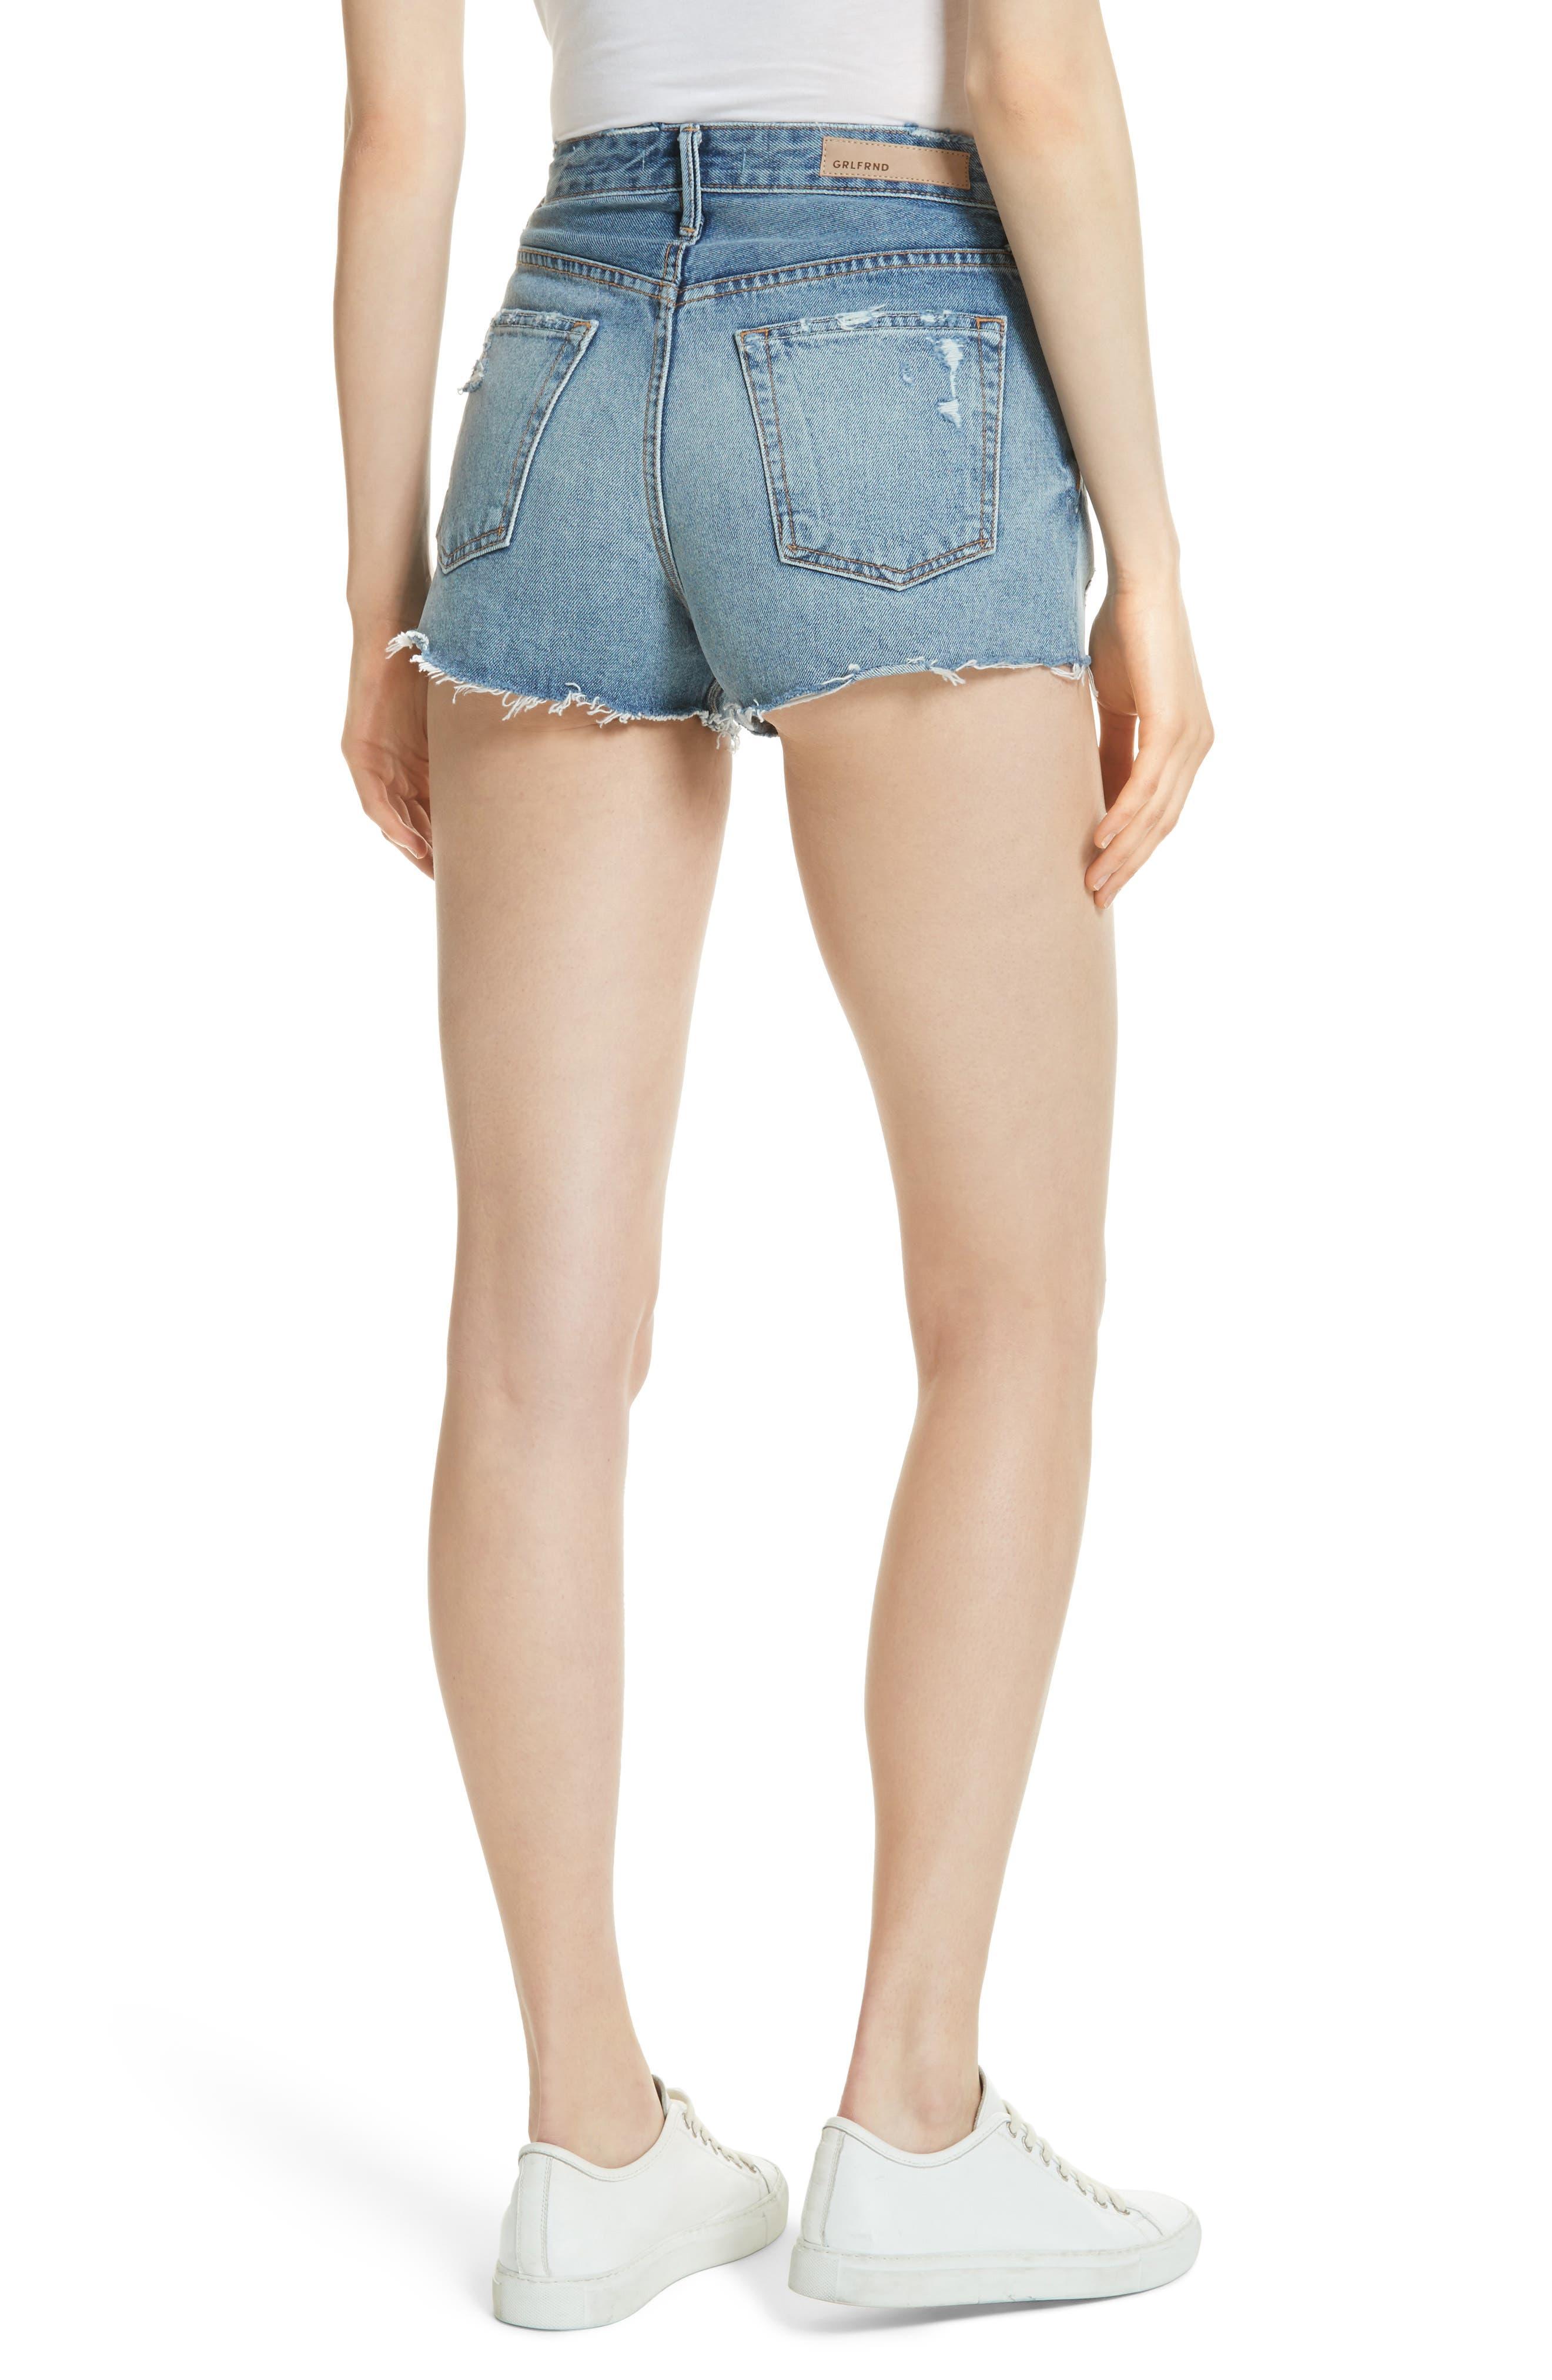 Cindy Rigid High Waist Denim Shorts,                             Alternate thumbnail 2, color,                             473